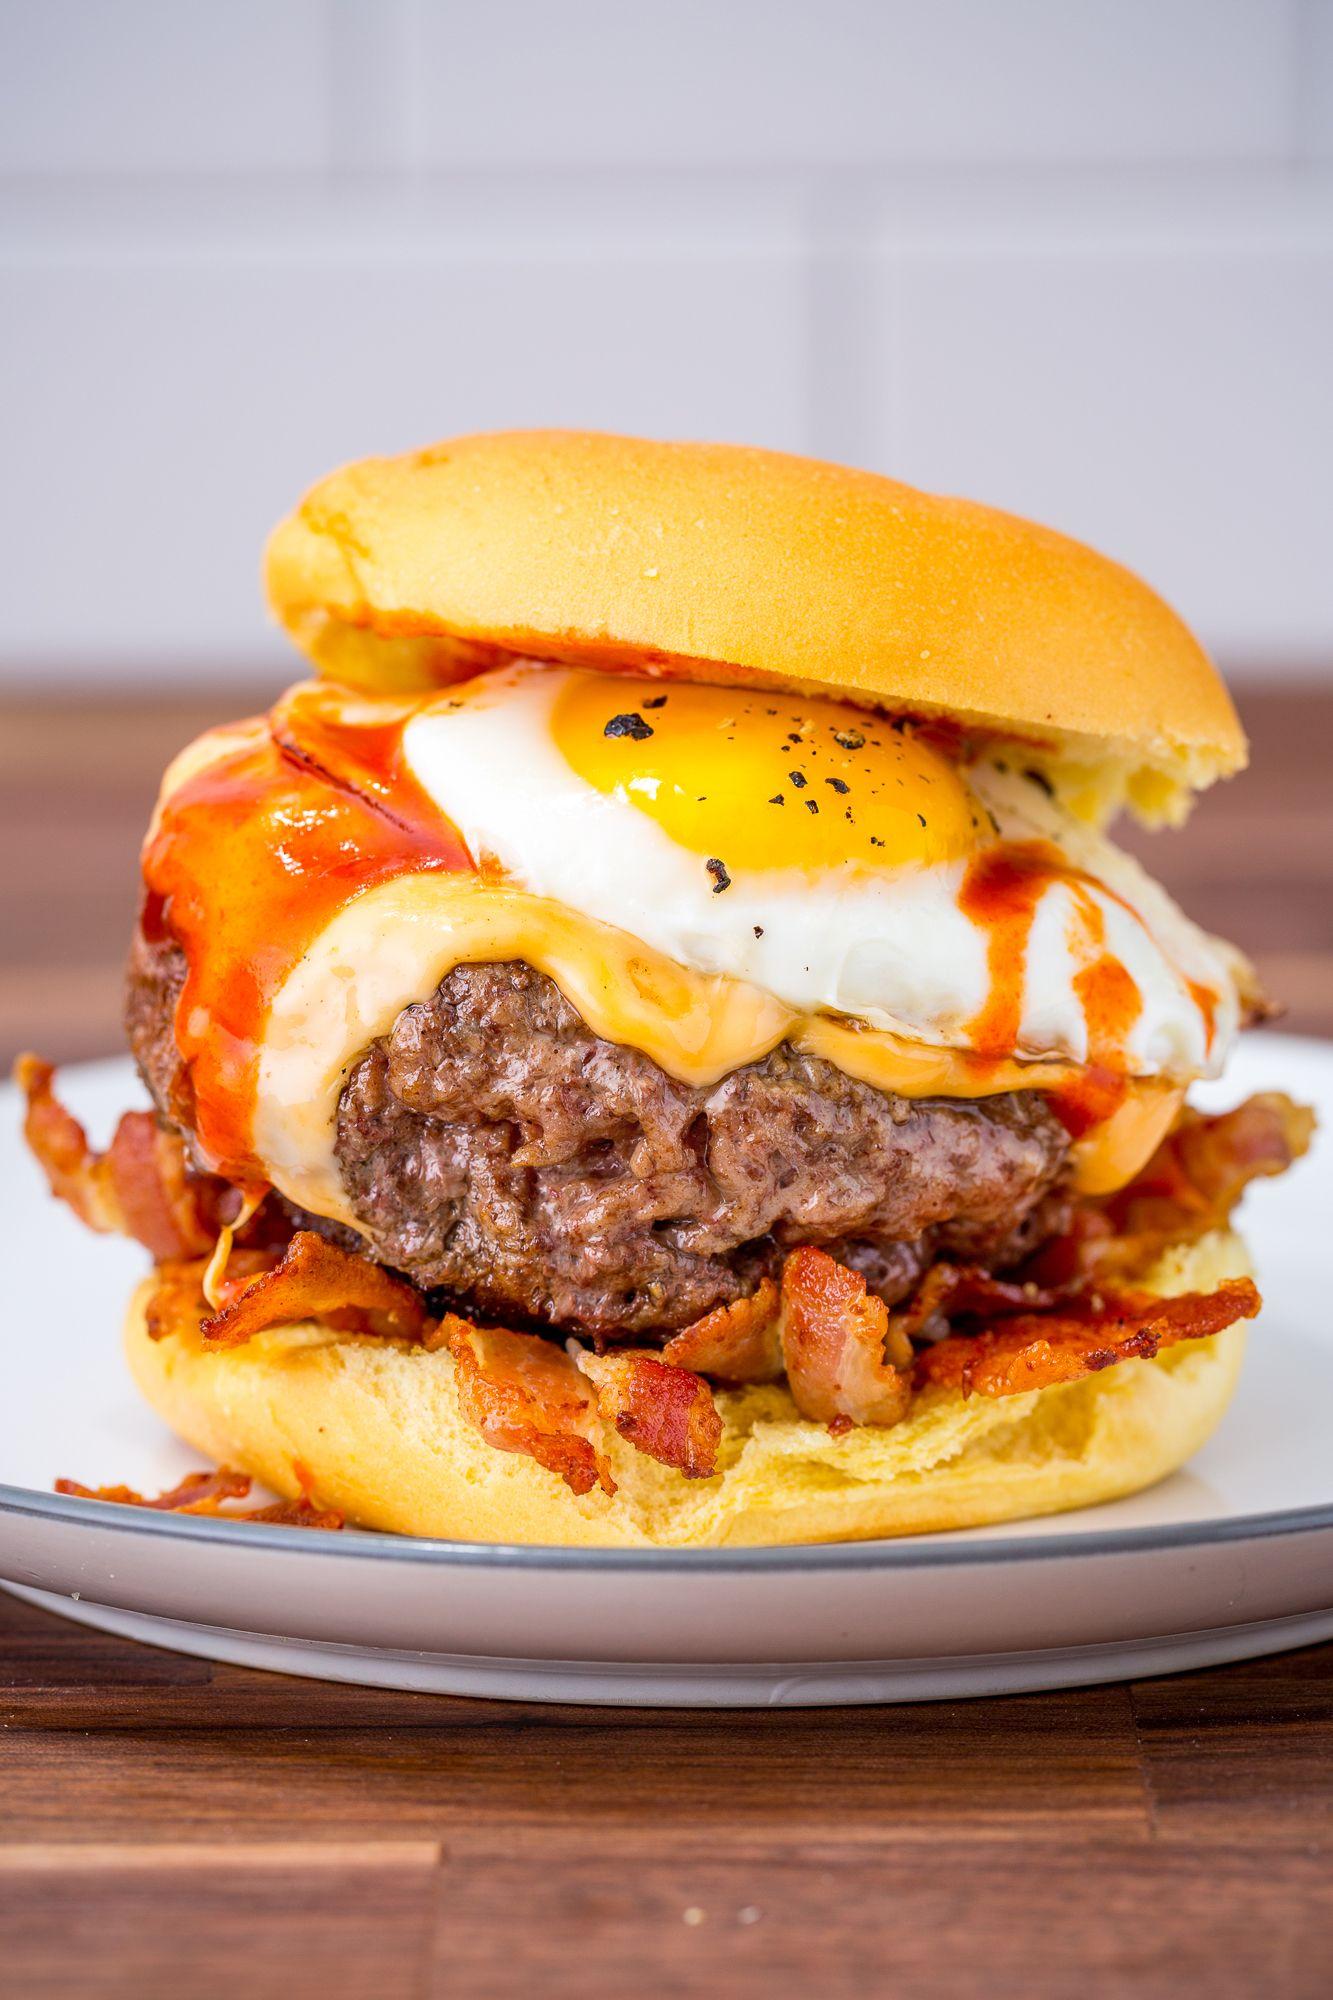 60 Best Burger Recipes Easy Hamburger Ideas